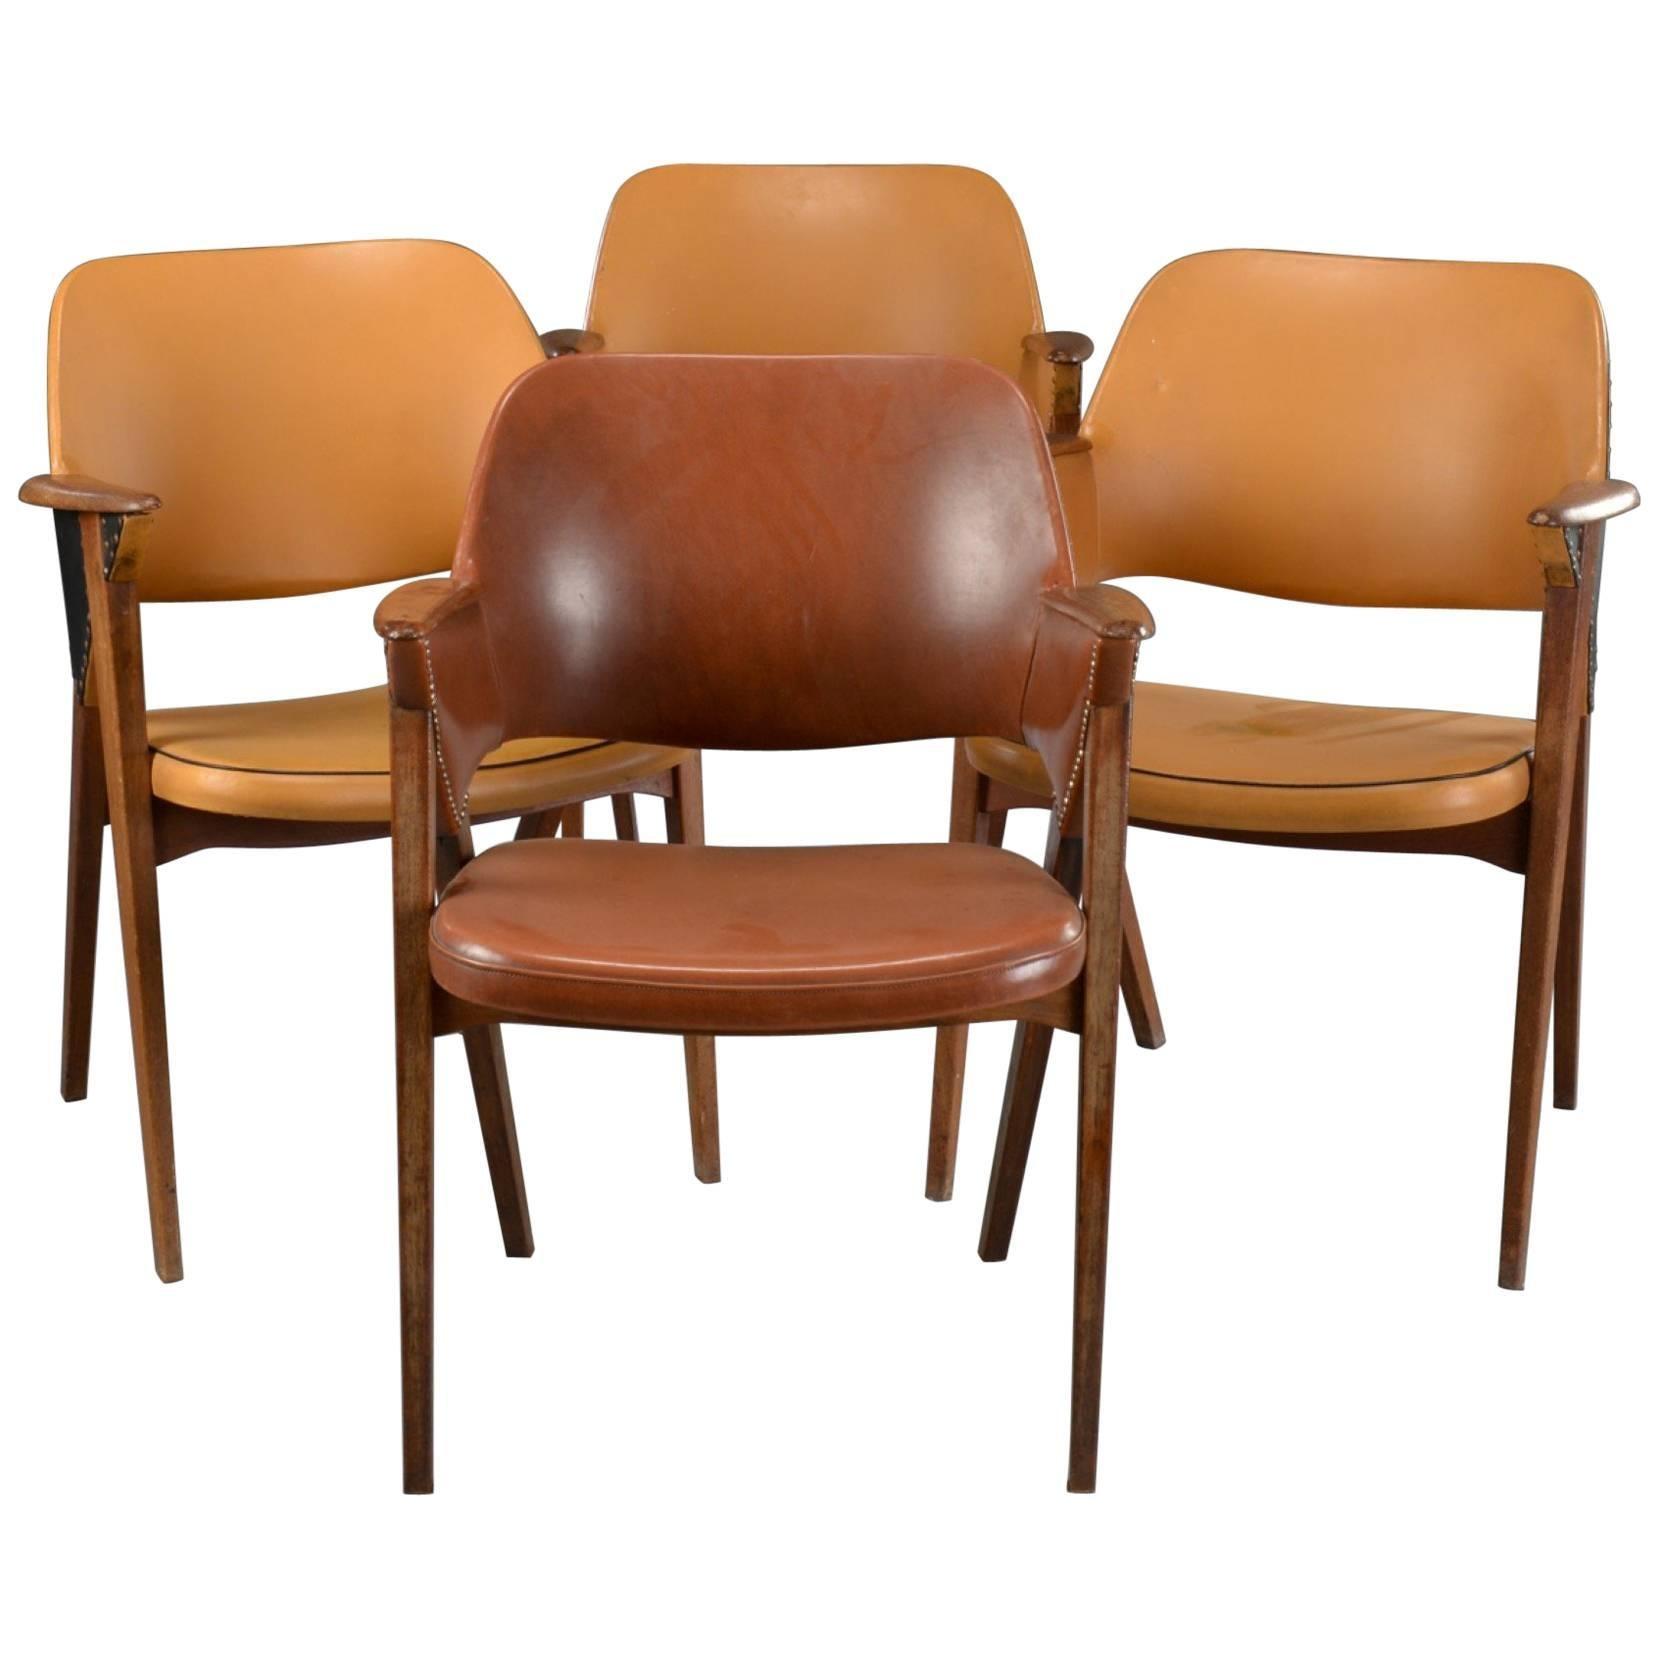 Set of Four Danish Modern Midcentury Teak Armchairs